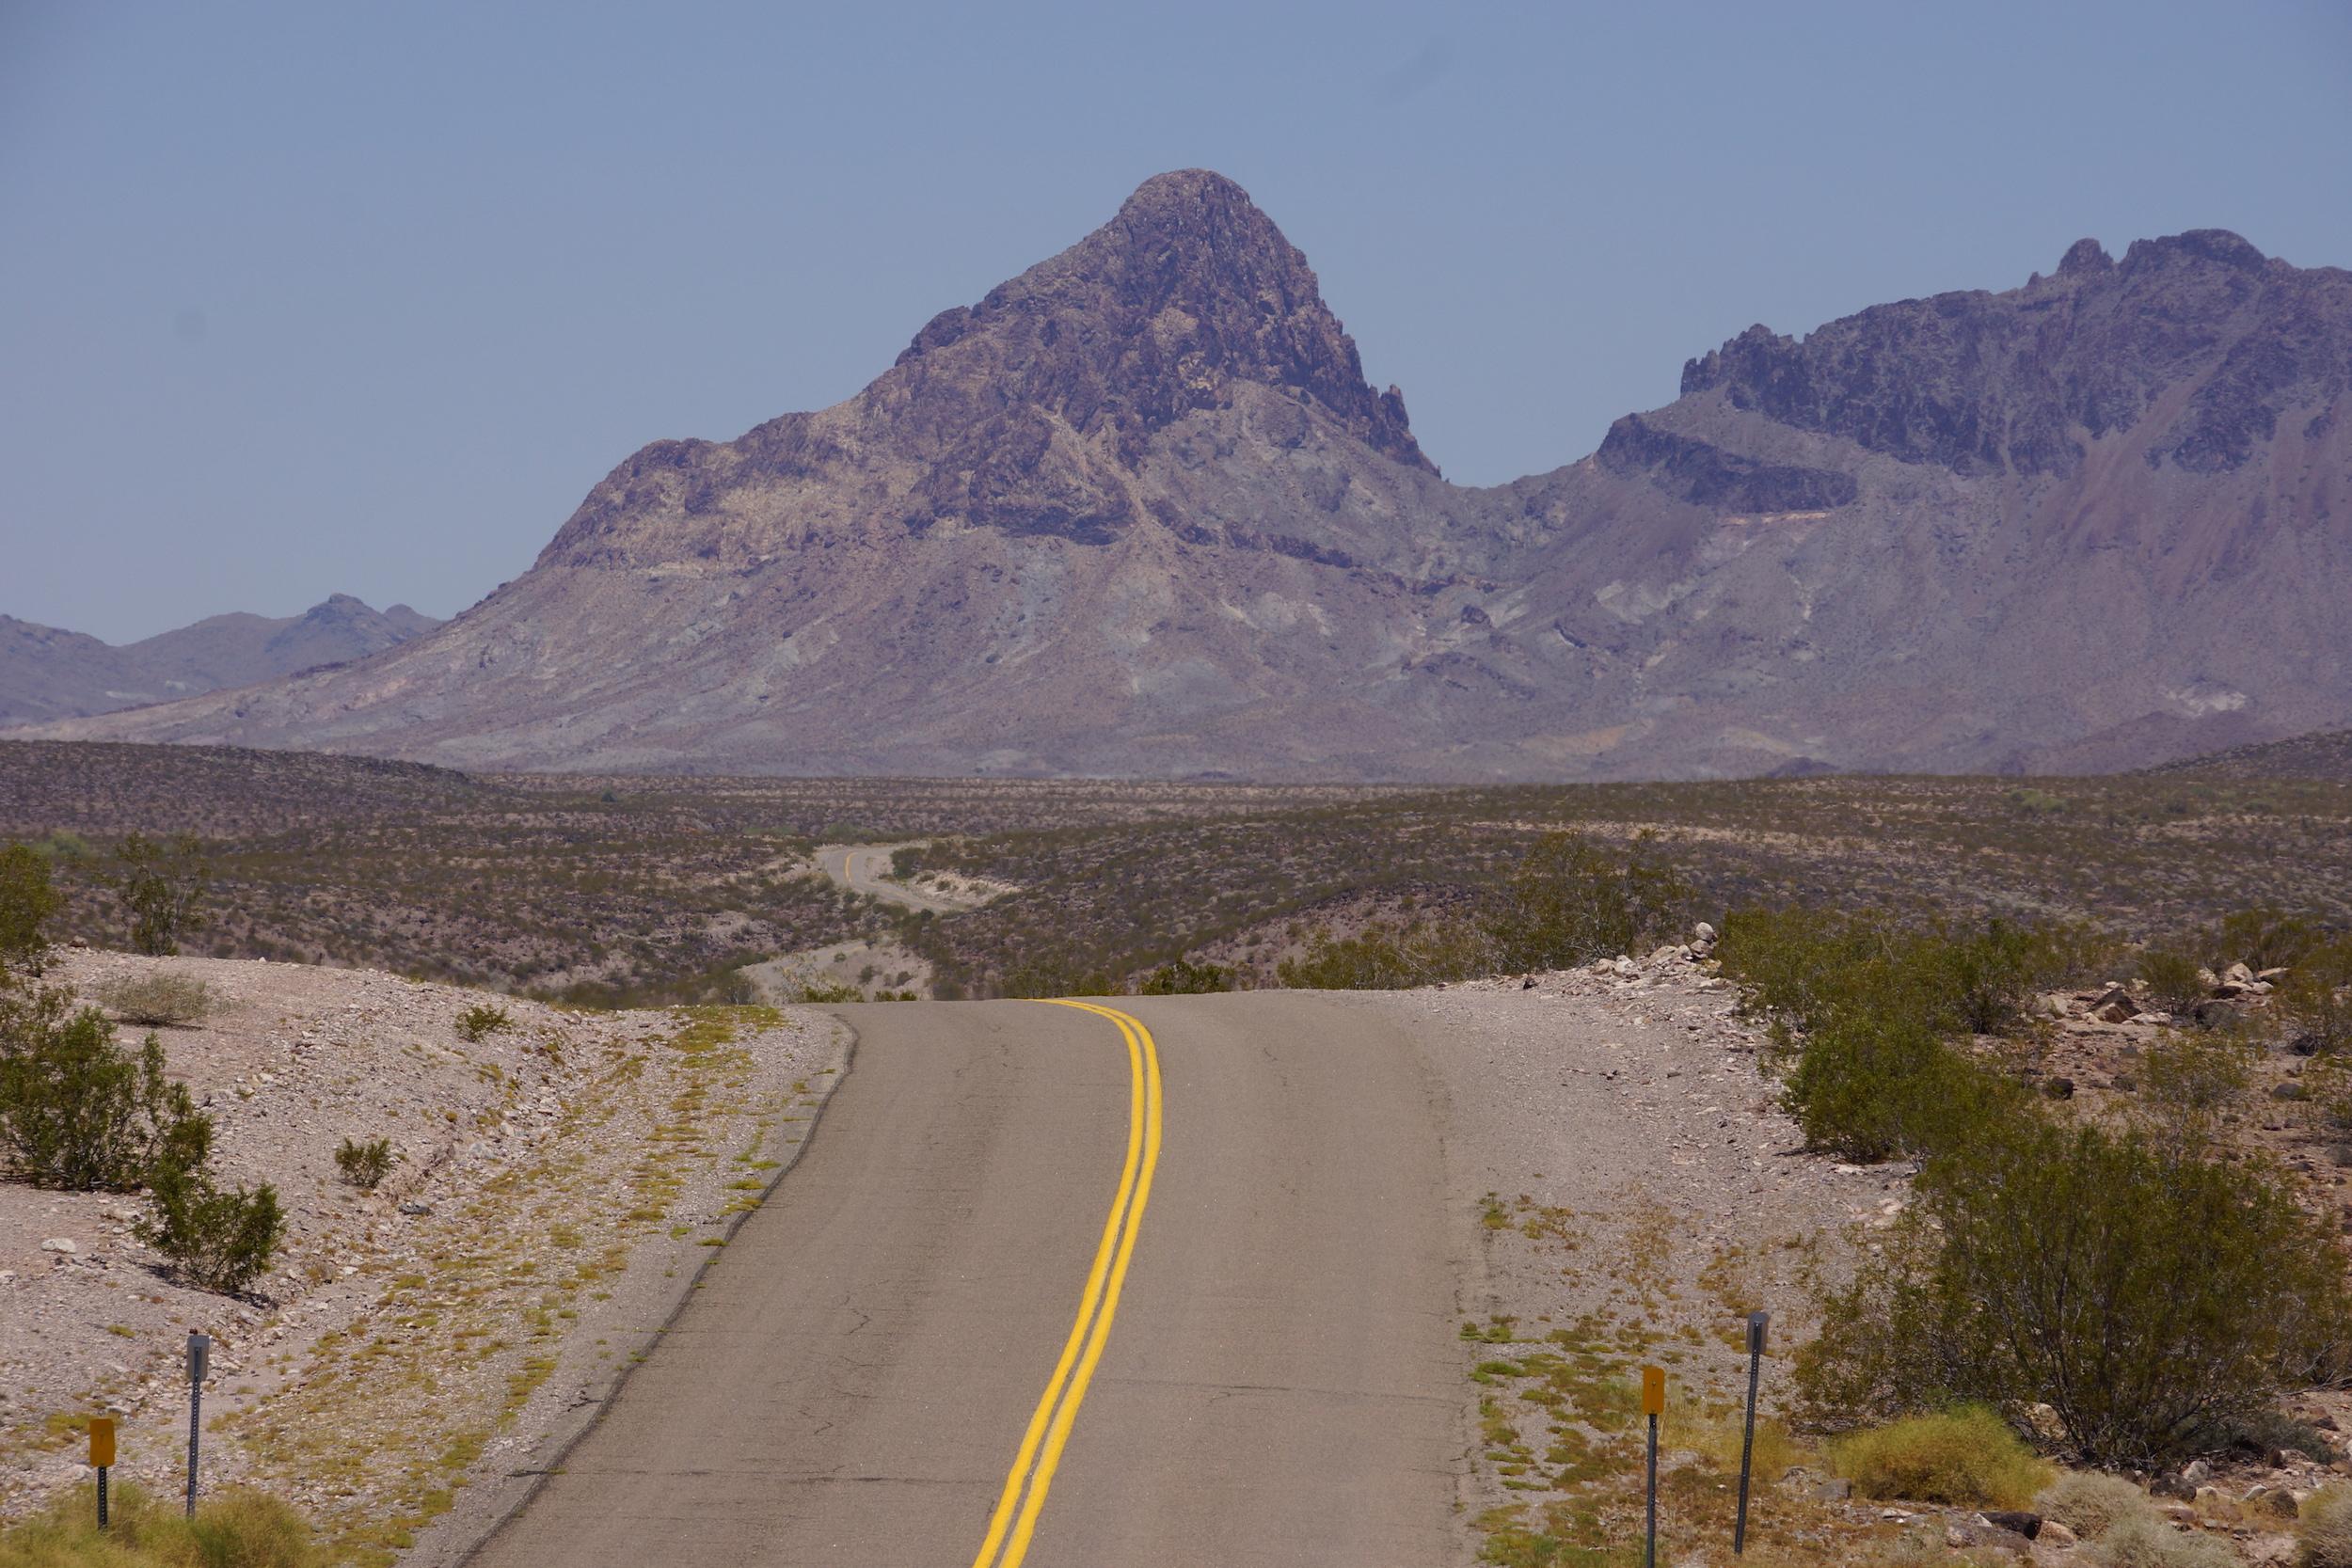 road-trip-usa-bumpy-road